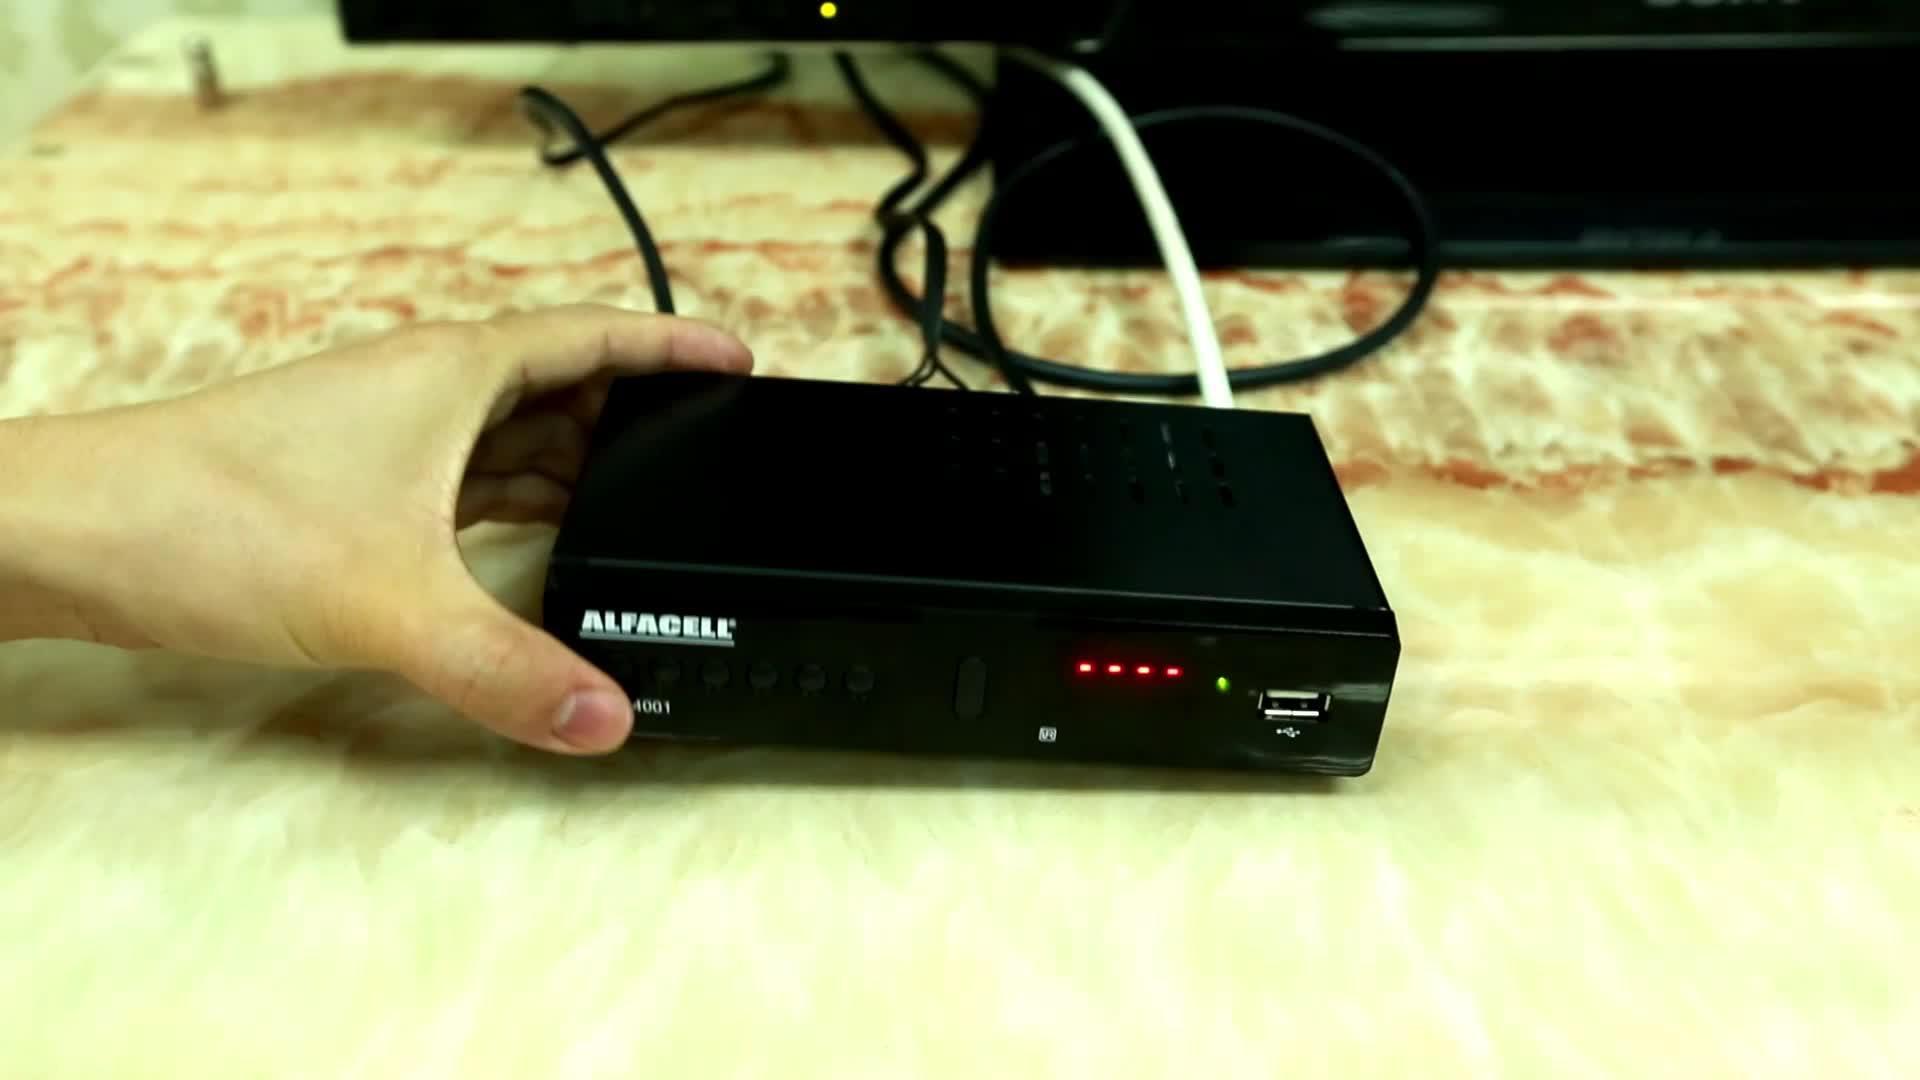 Isdb-t modulatore tv box fabbrica fabbricazione Filippine HD 1080 p analogico a digitale isdb-t decoder